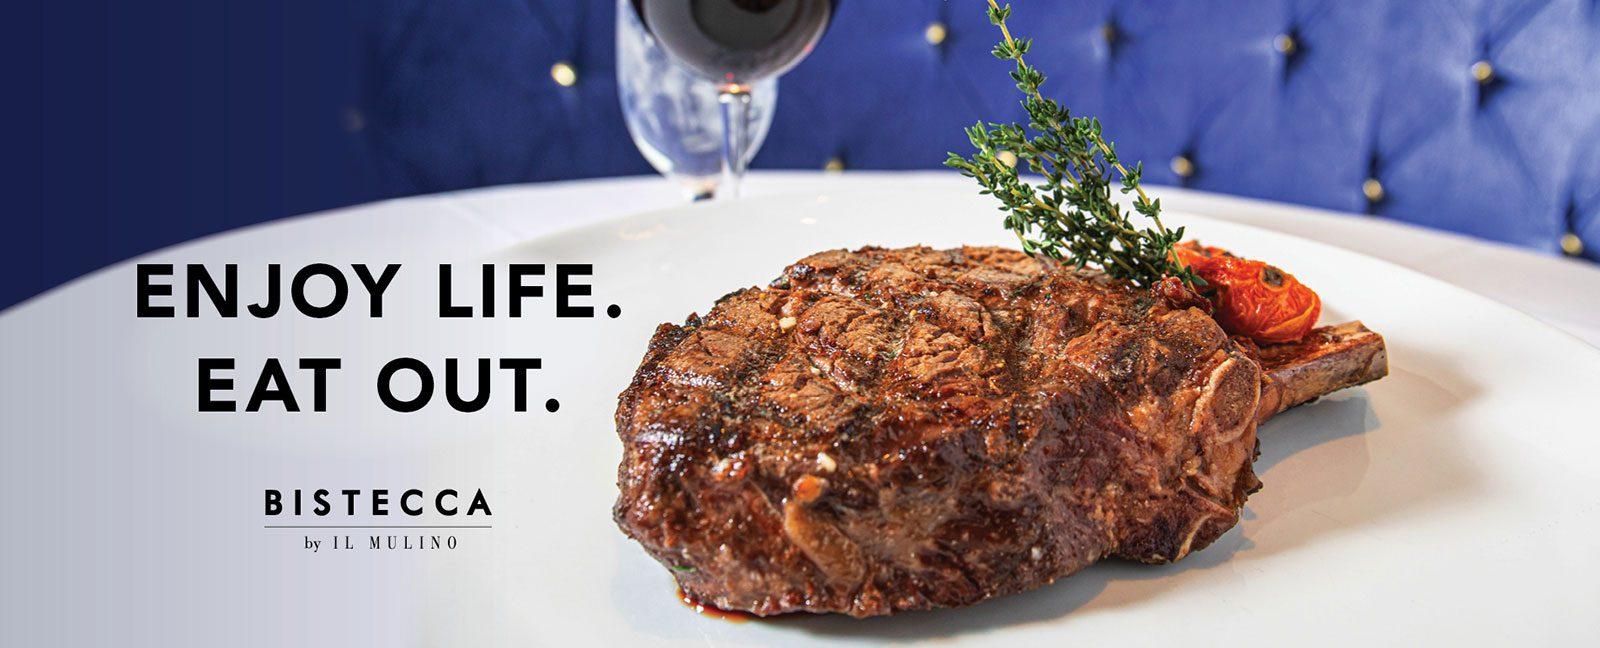 enjoy life. eat out.